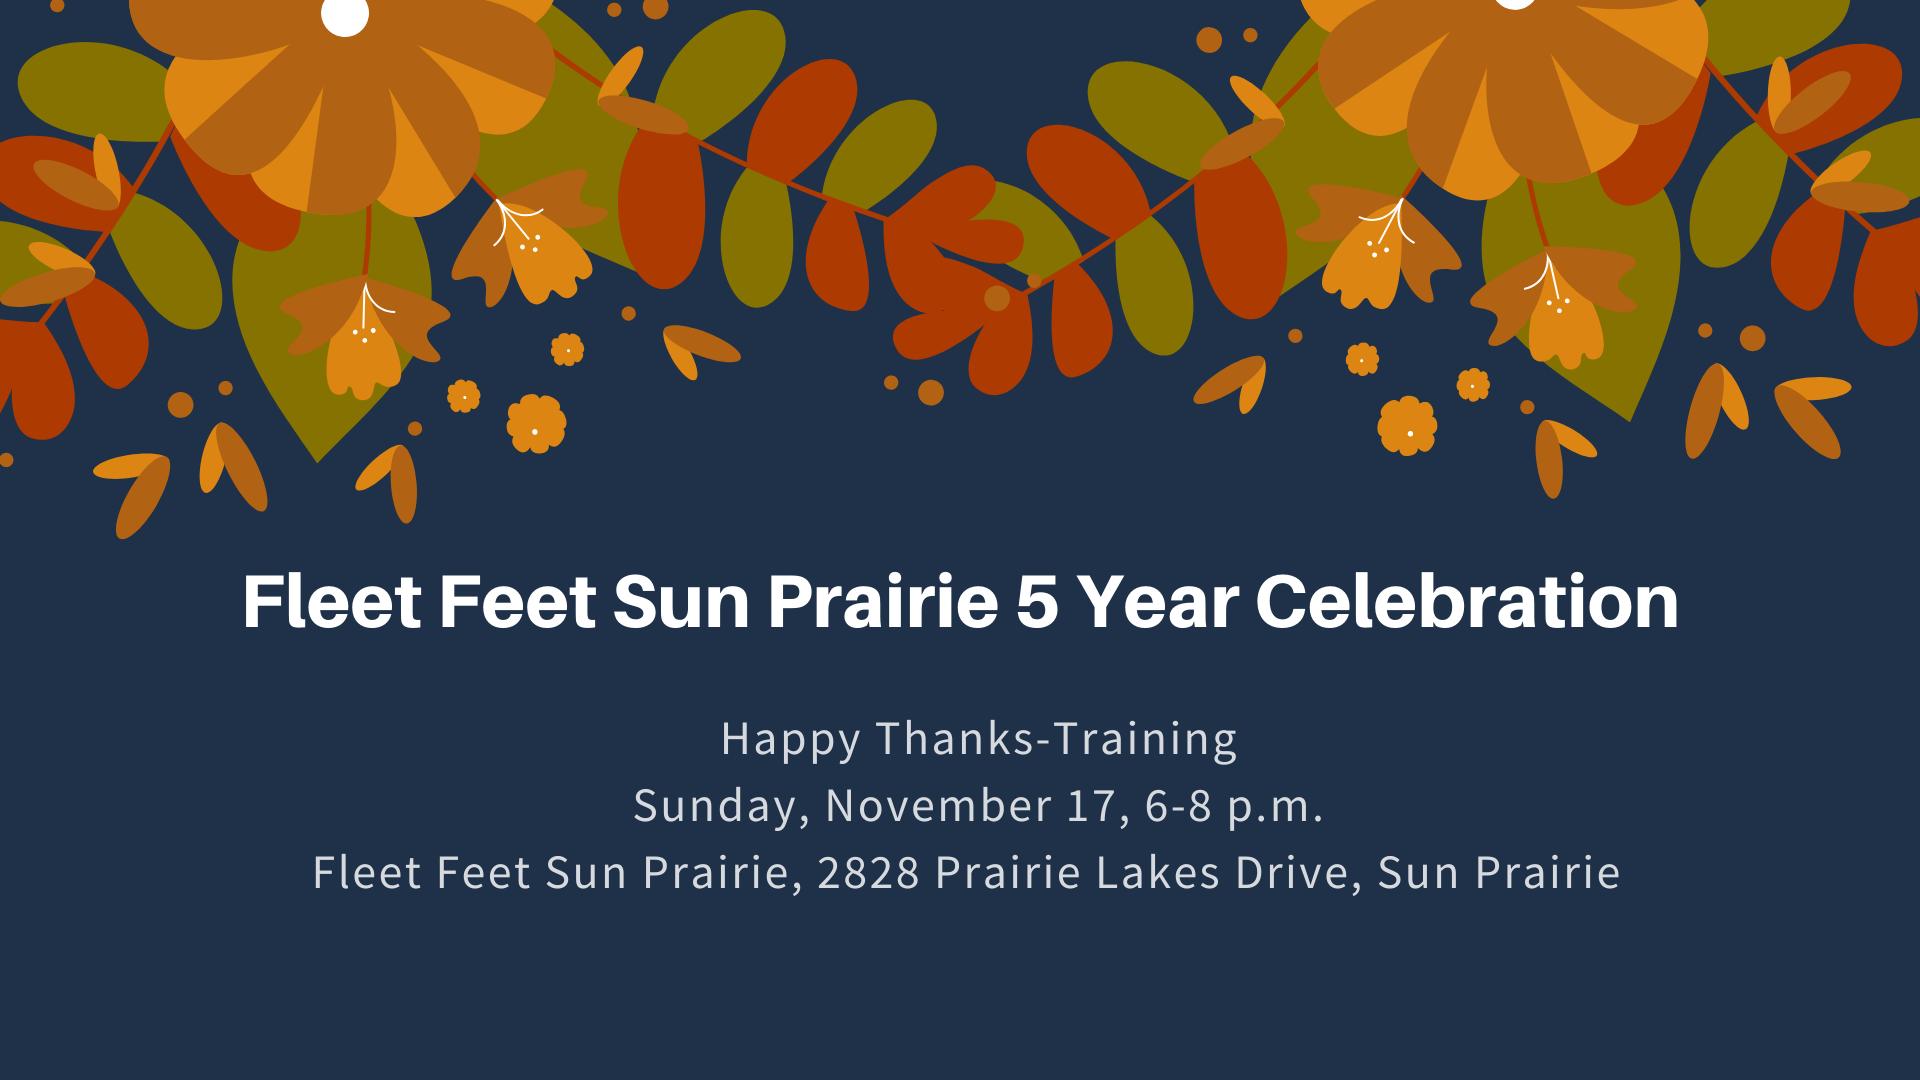 Fleet Feet Sun Prairie 5 year celebration